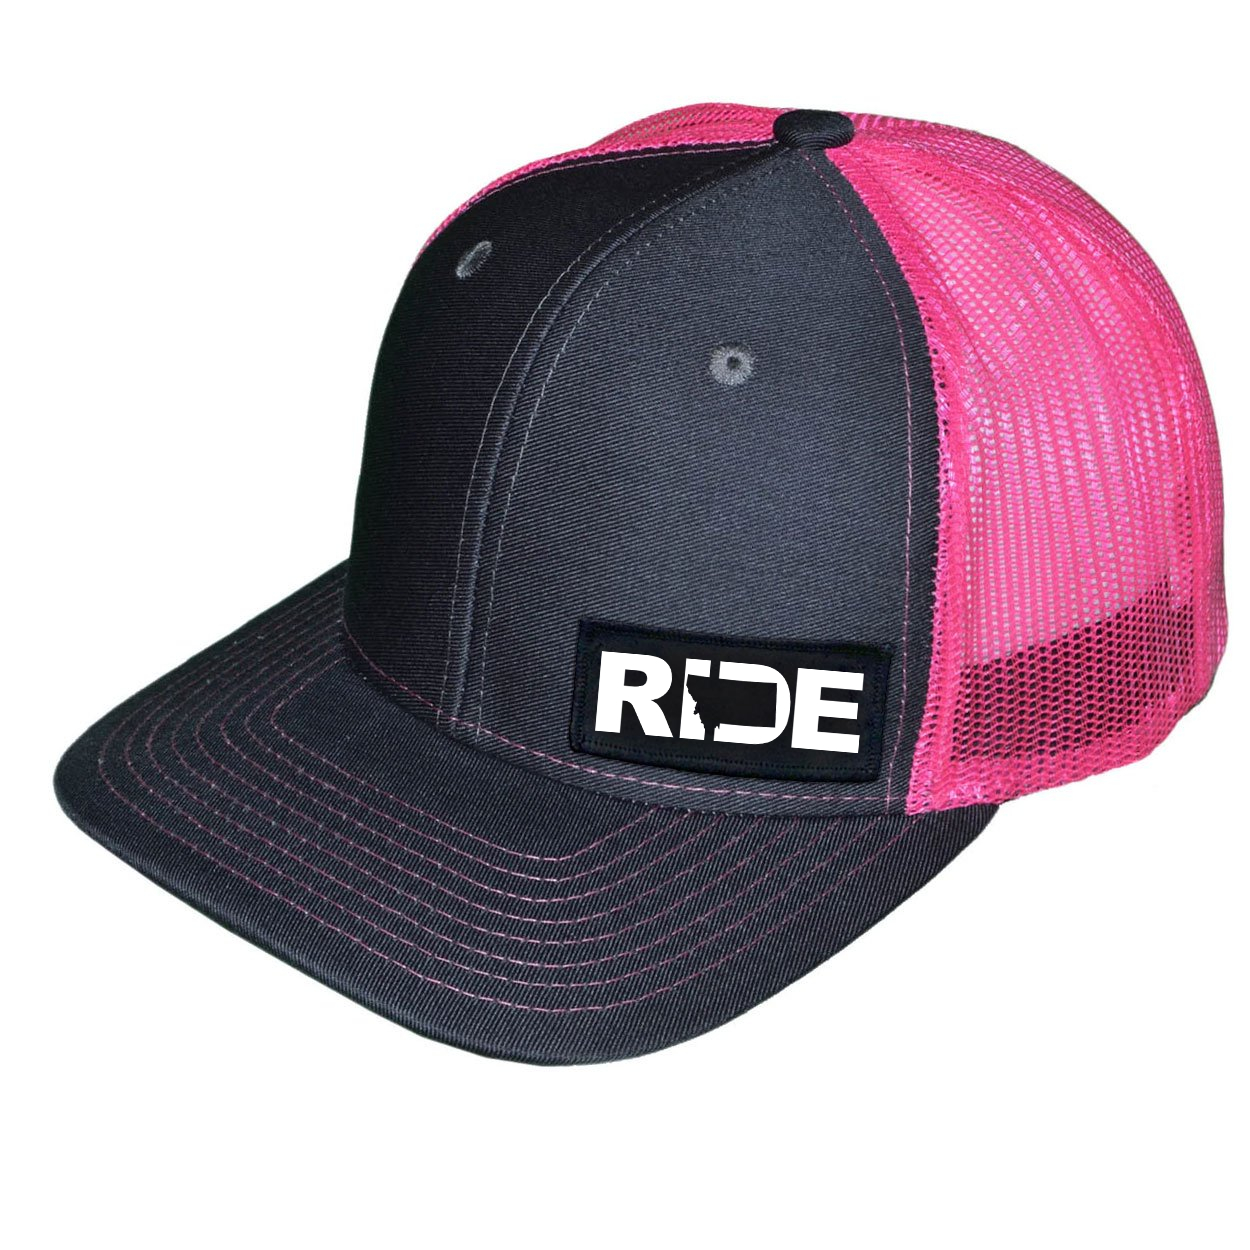 Ride Montana Night Out Woven Patch Snapback Trucker Hat Dark Gray/Neon Pink (White Logo)